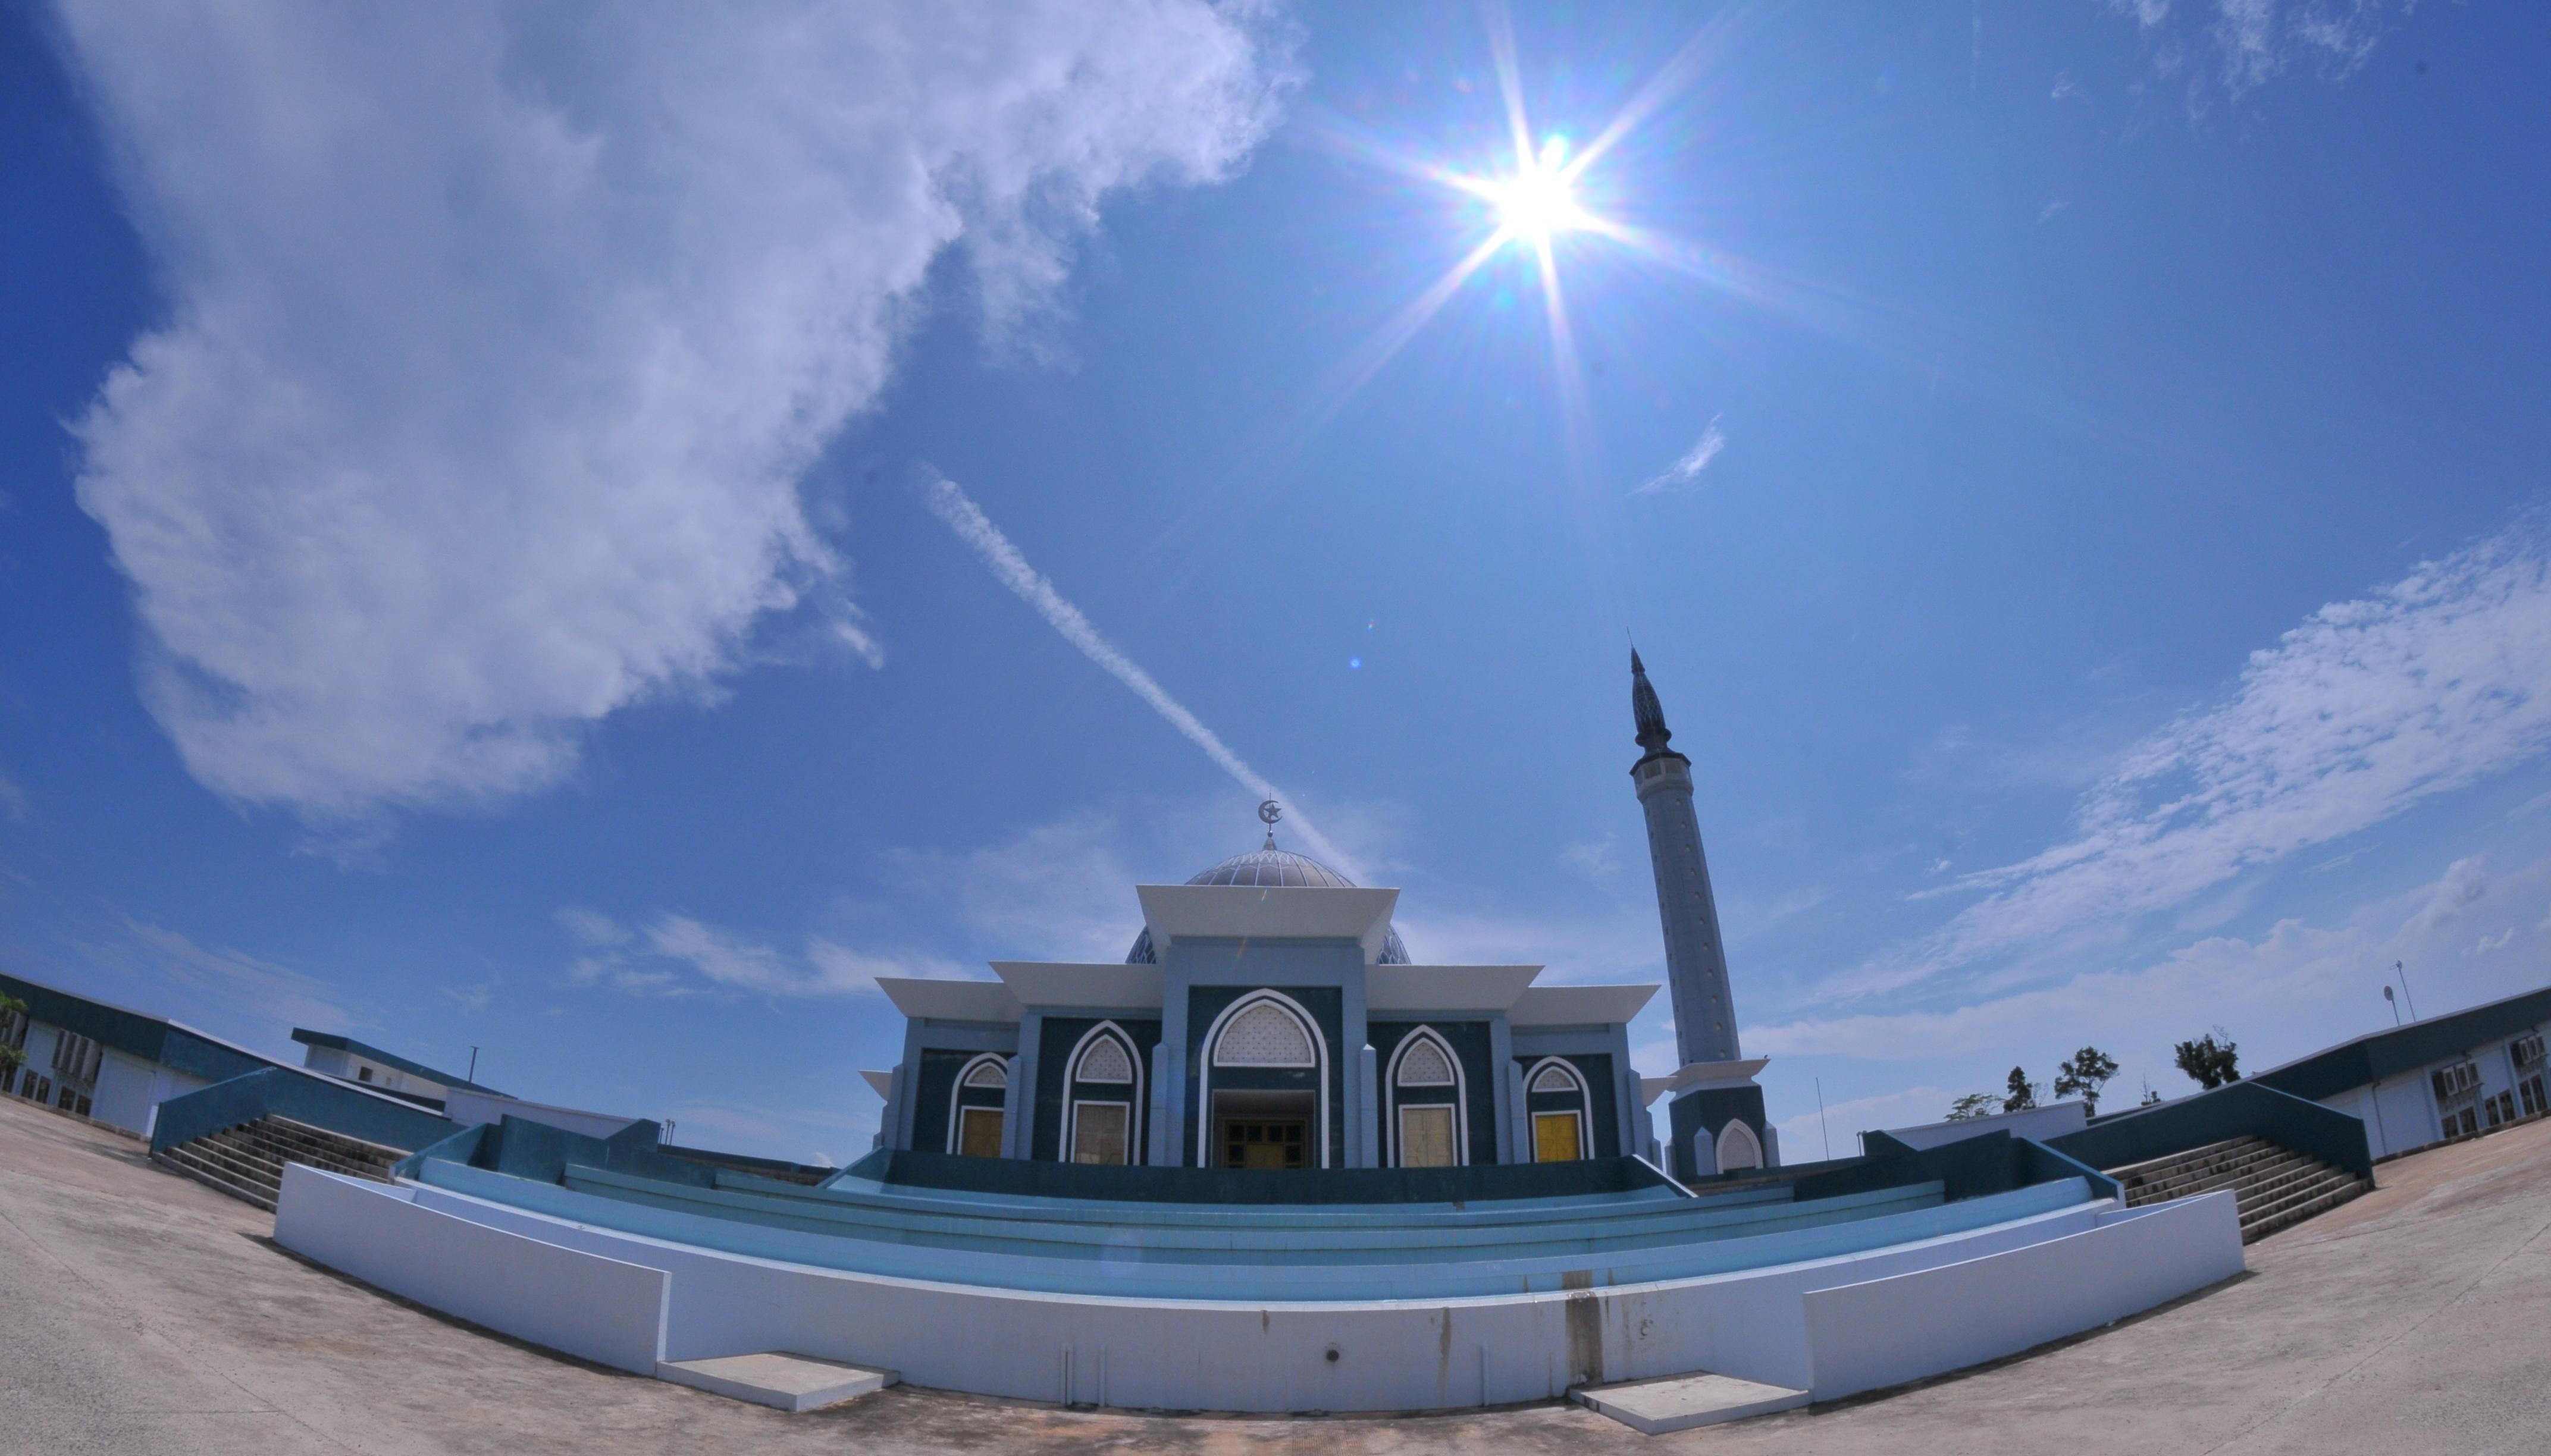 Mengintip Masjid Indah Pulau Dompak Robbi Hafzan Dsc 4123 Raya